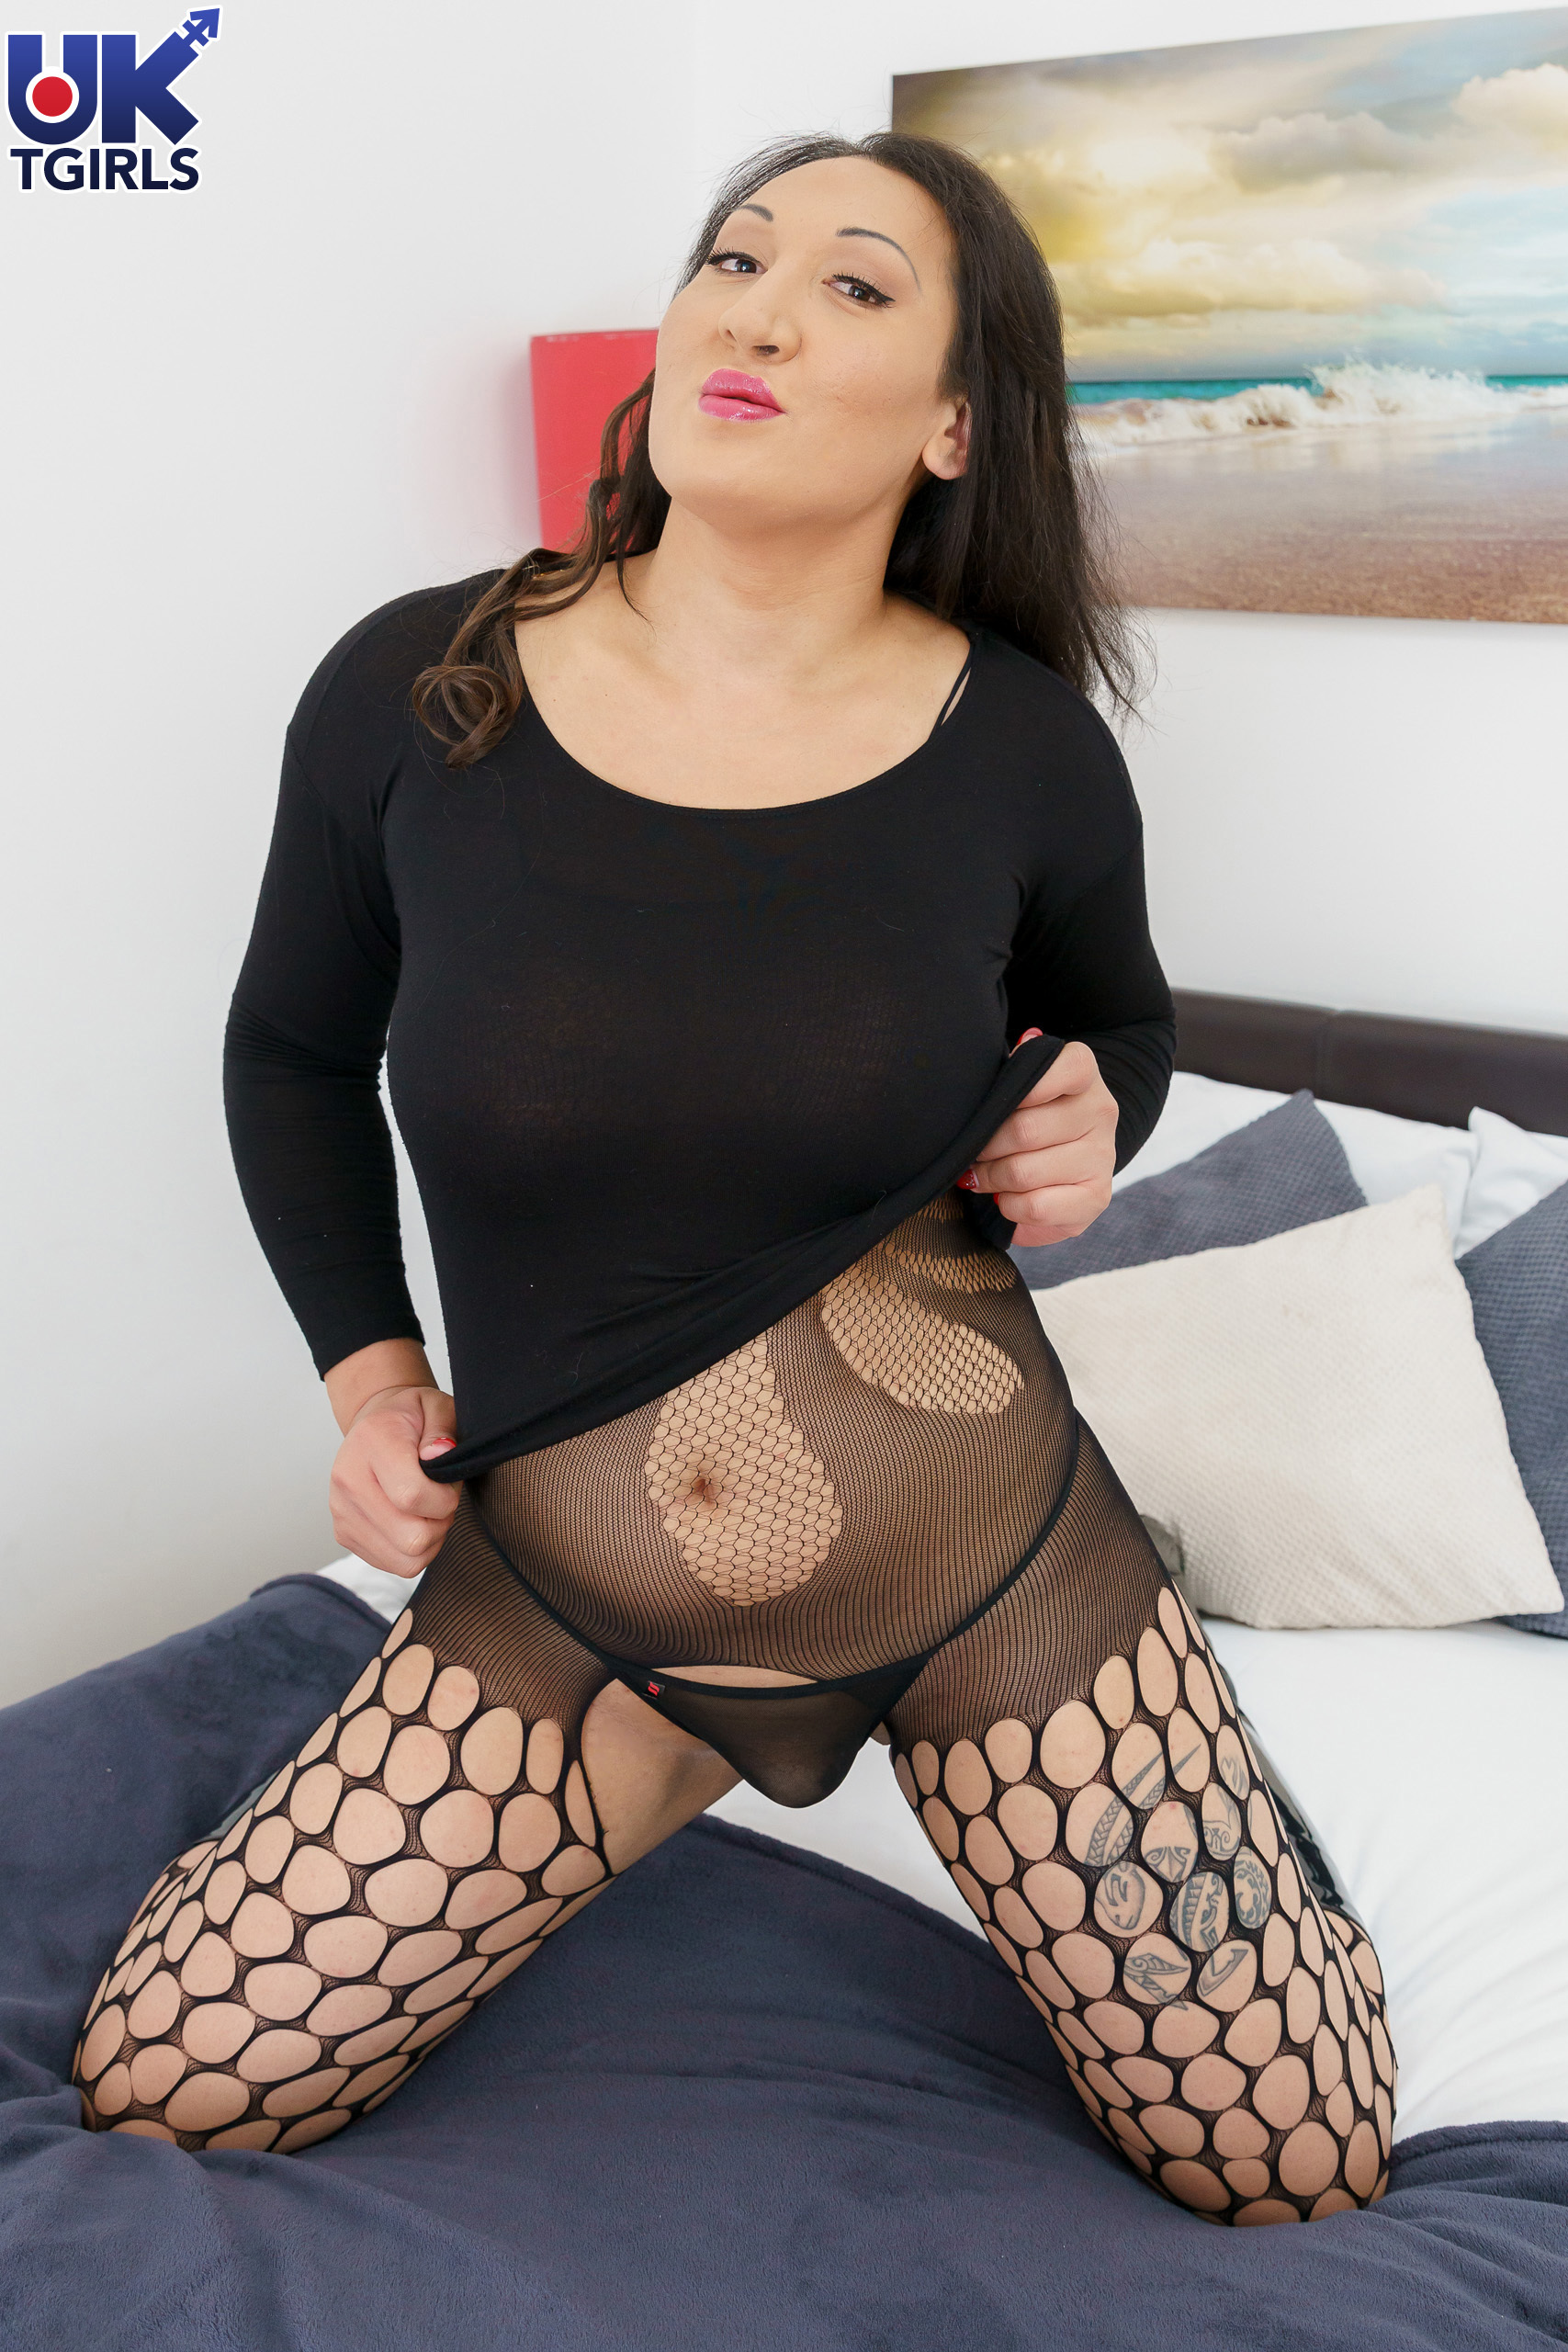 This Arousing Babe Has An Exo